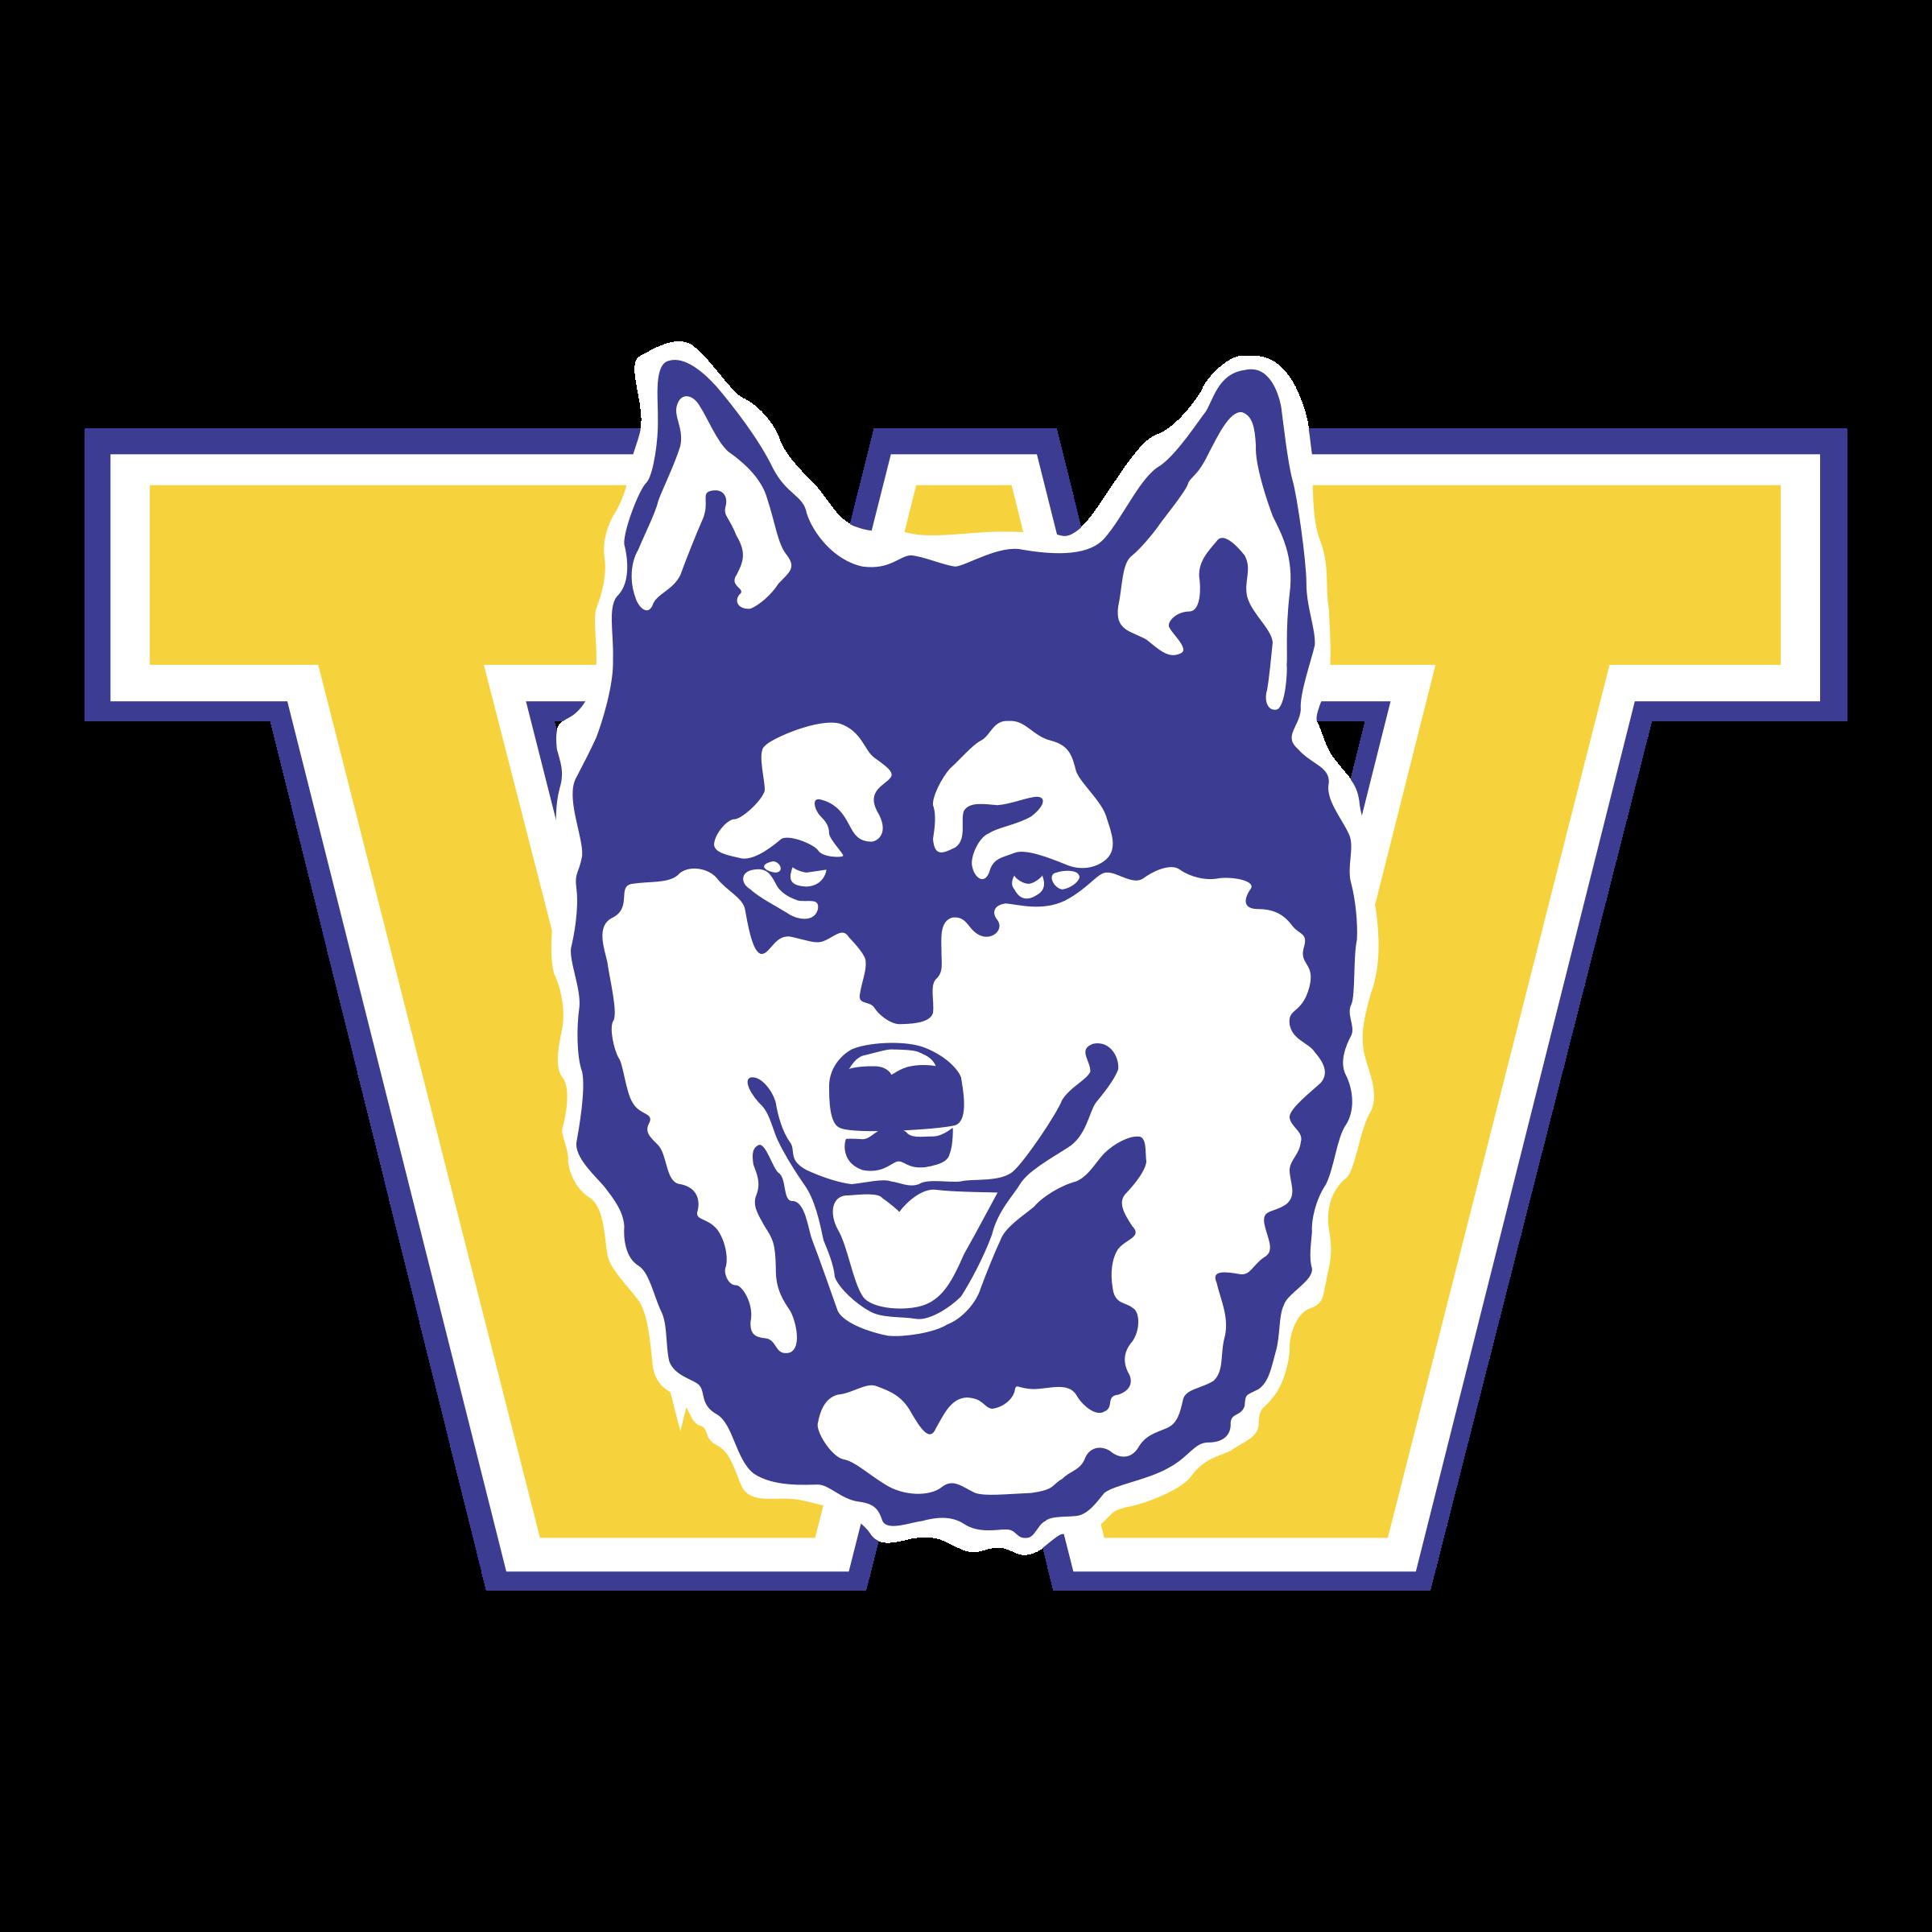 Husky clipart svg. Washington huskies logo png